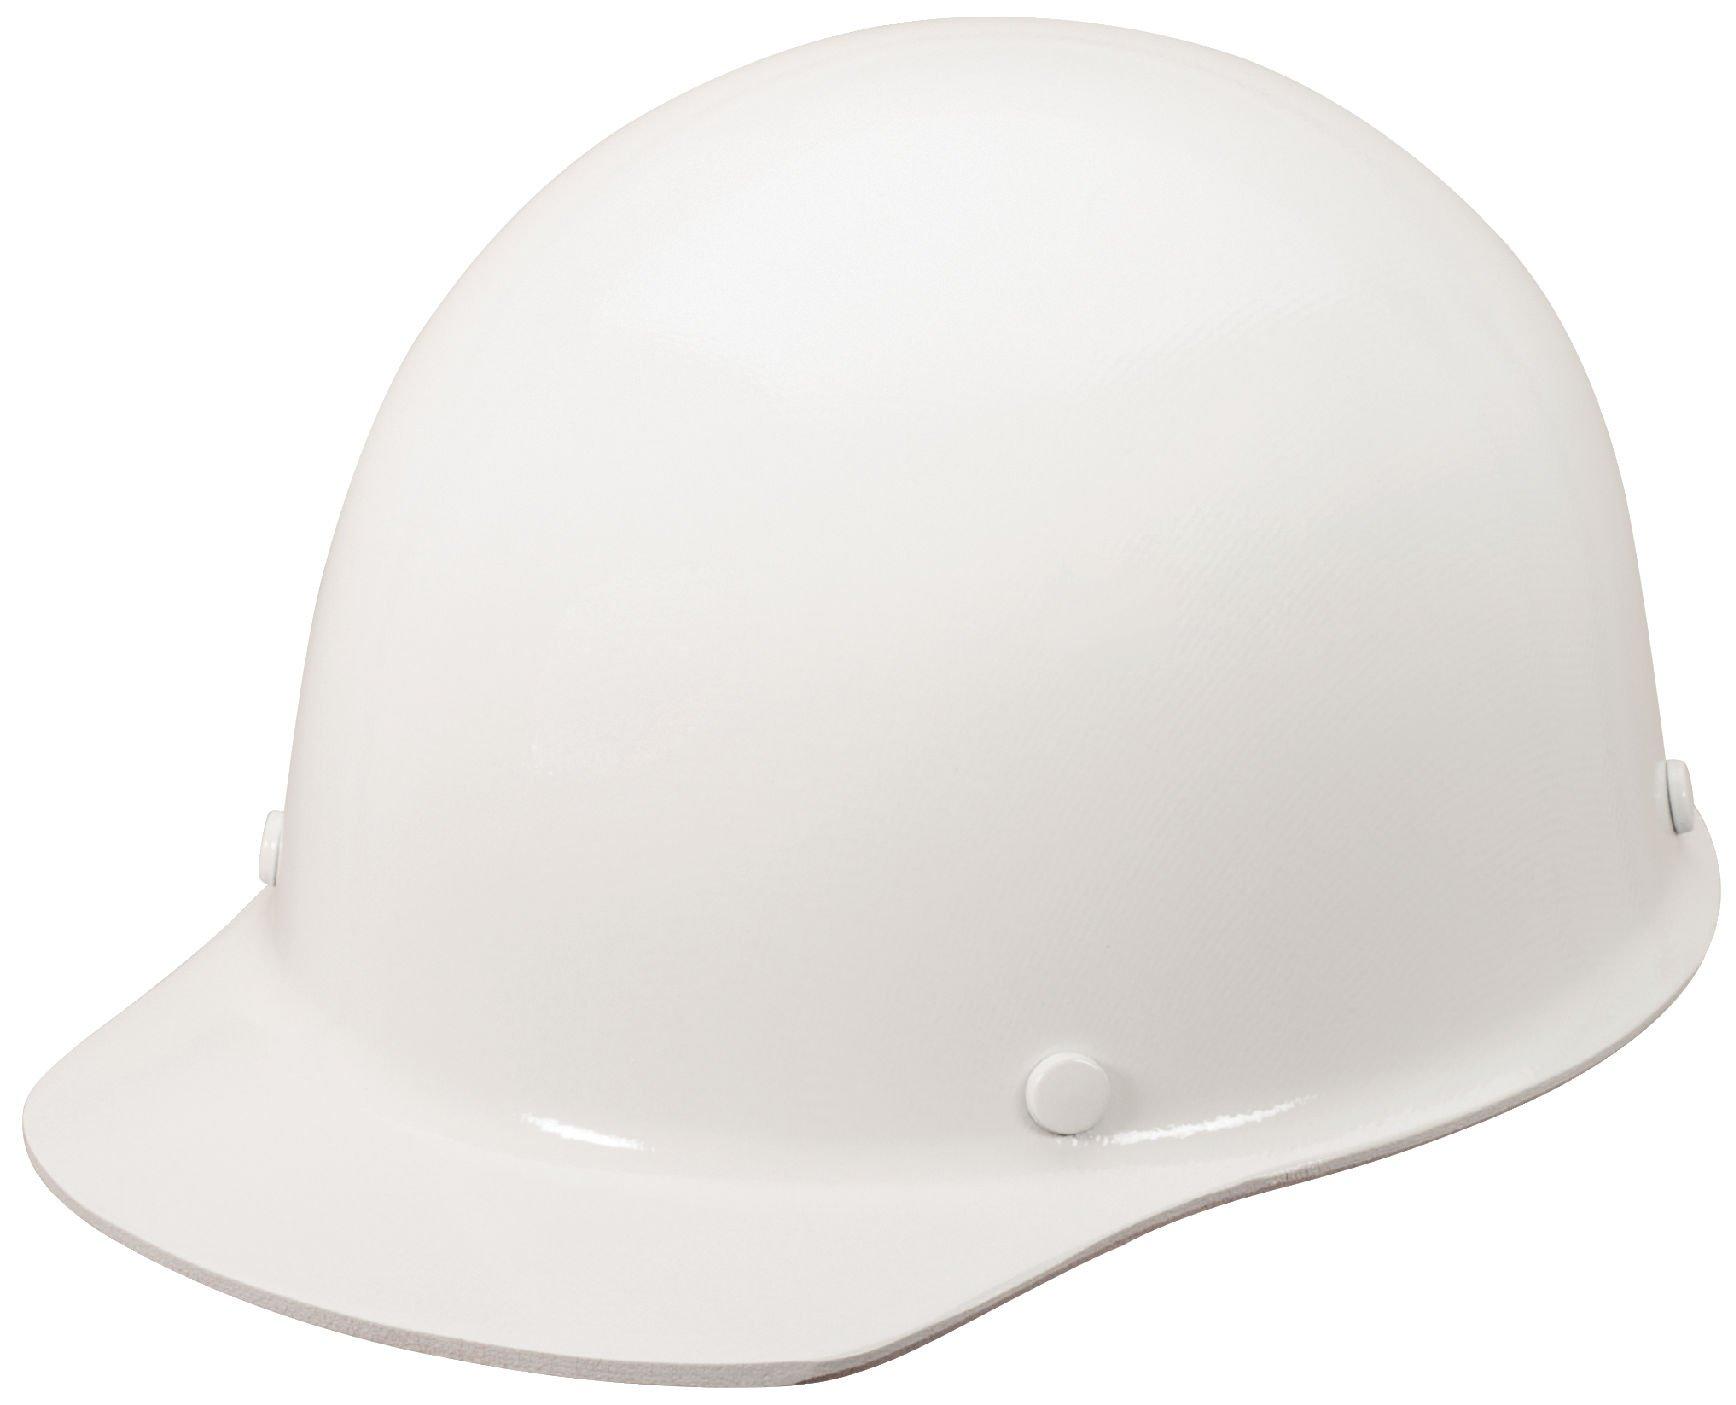 MSA 10119699 Skullgard Protective Cap with Ratchet, Type B, Large Size, Strobe White